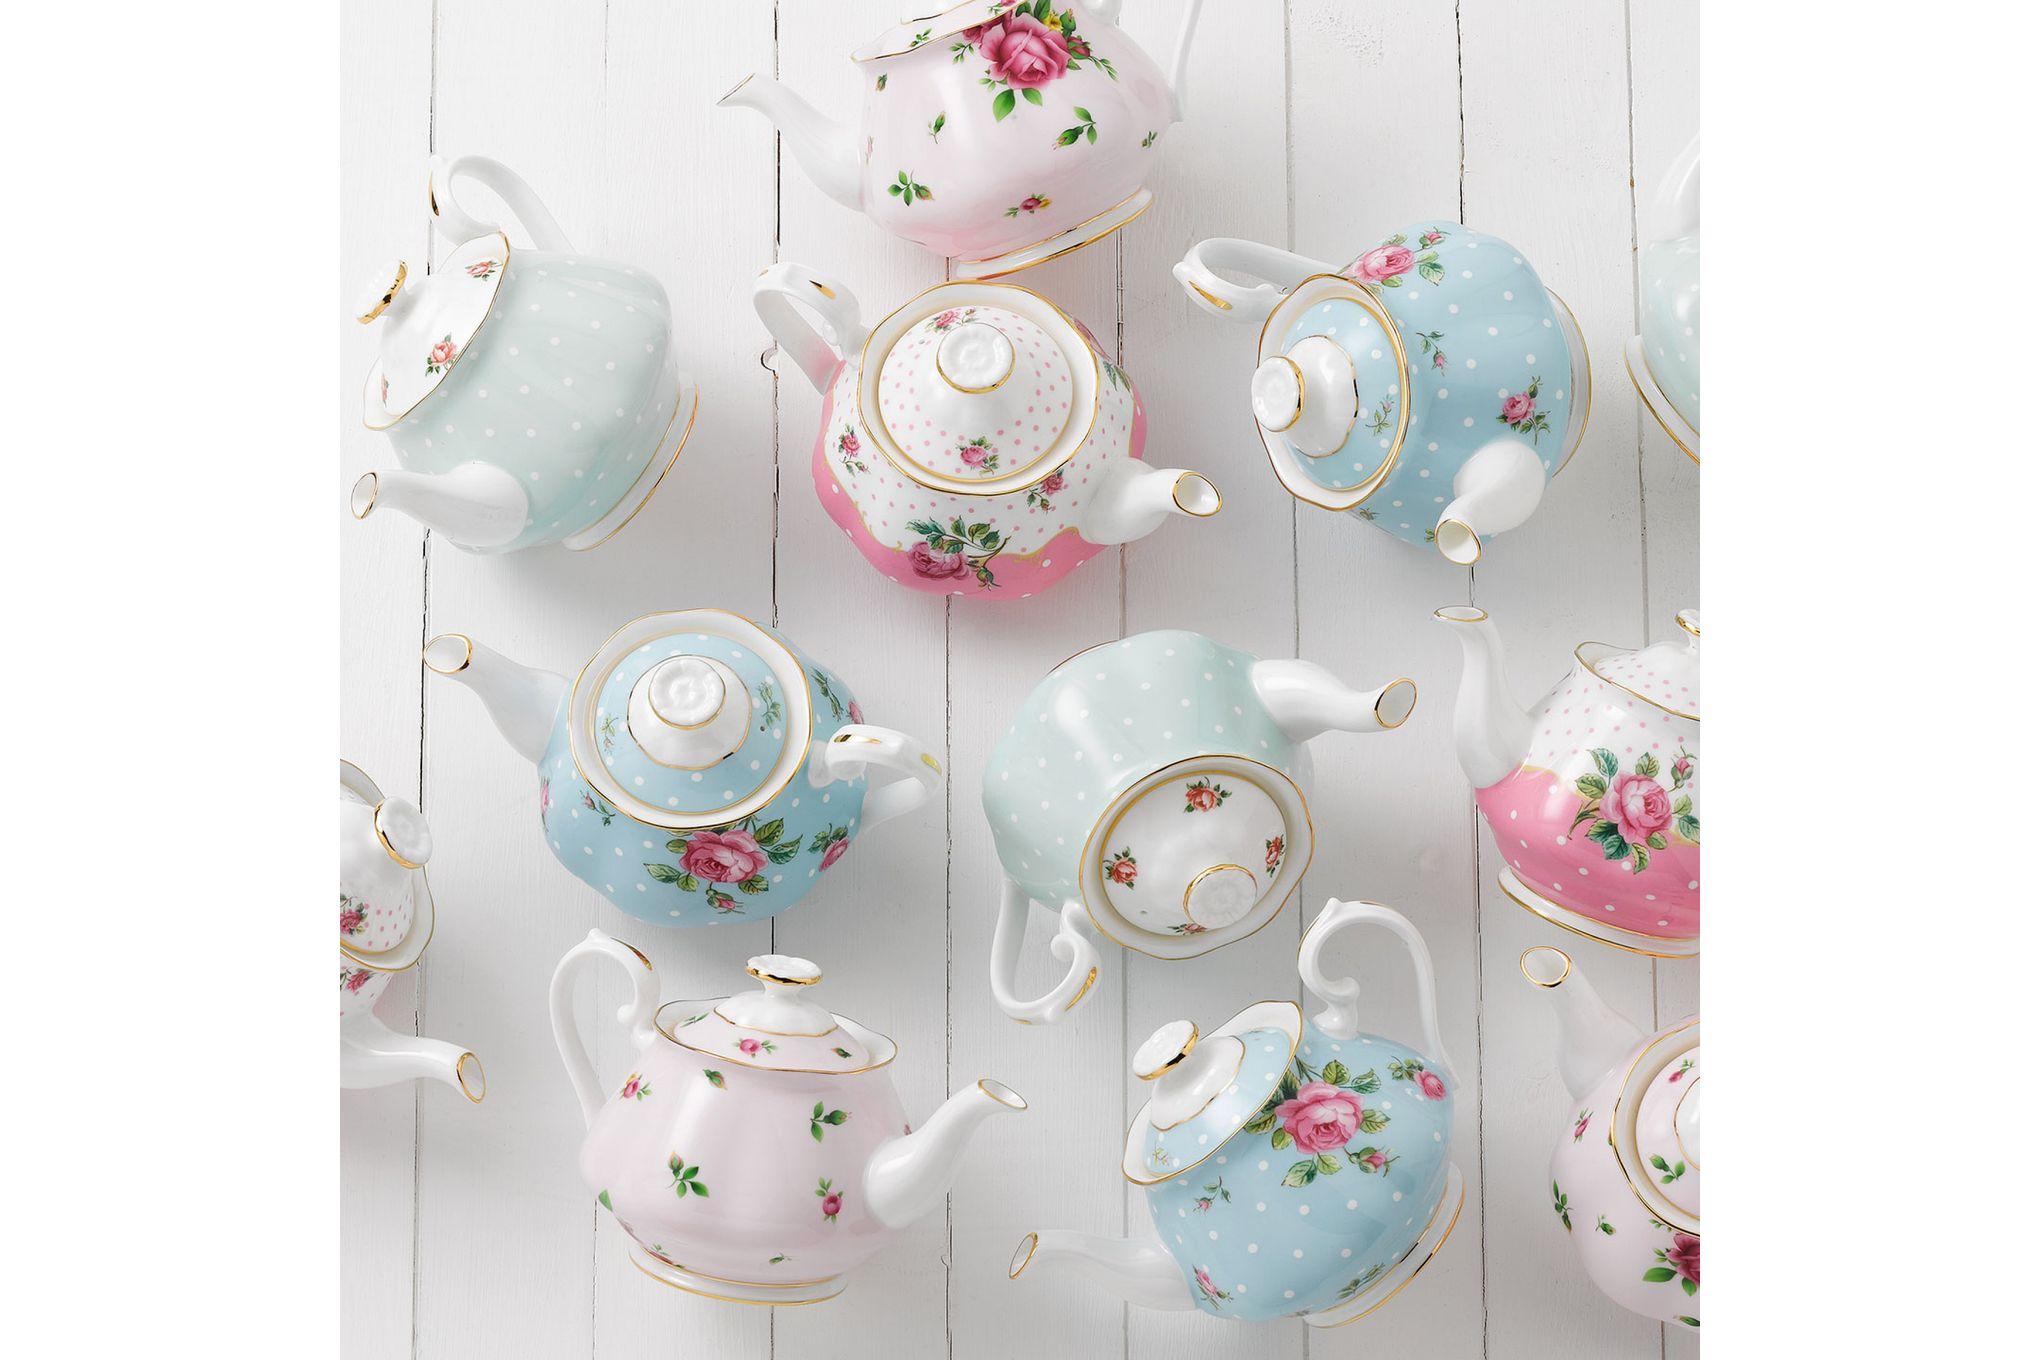 Royal Albert Polka Rose Teapot thumb 3